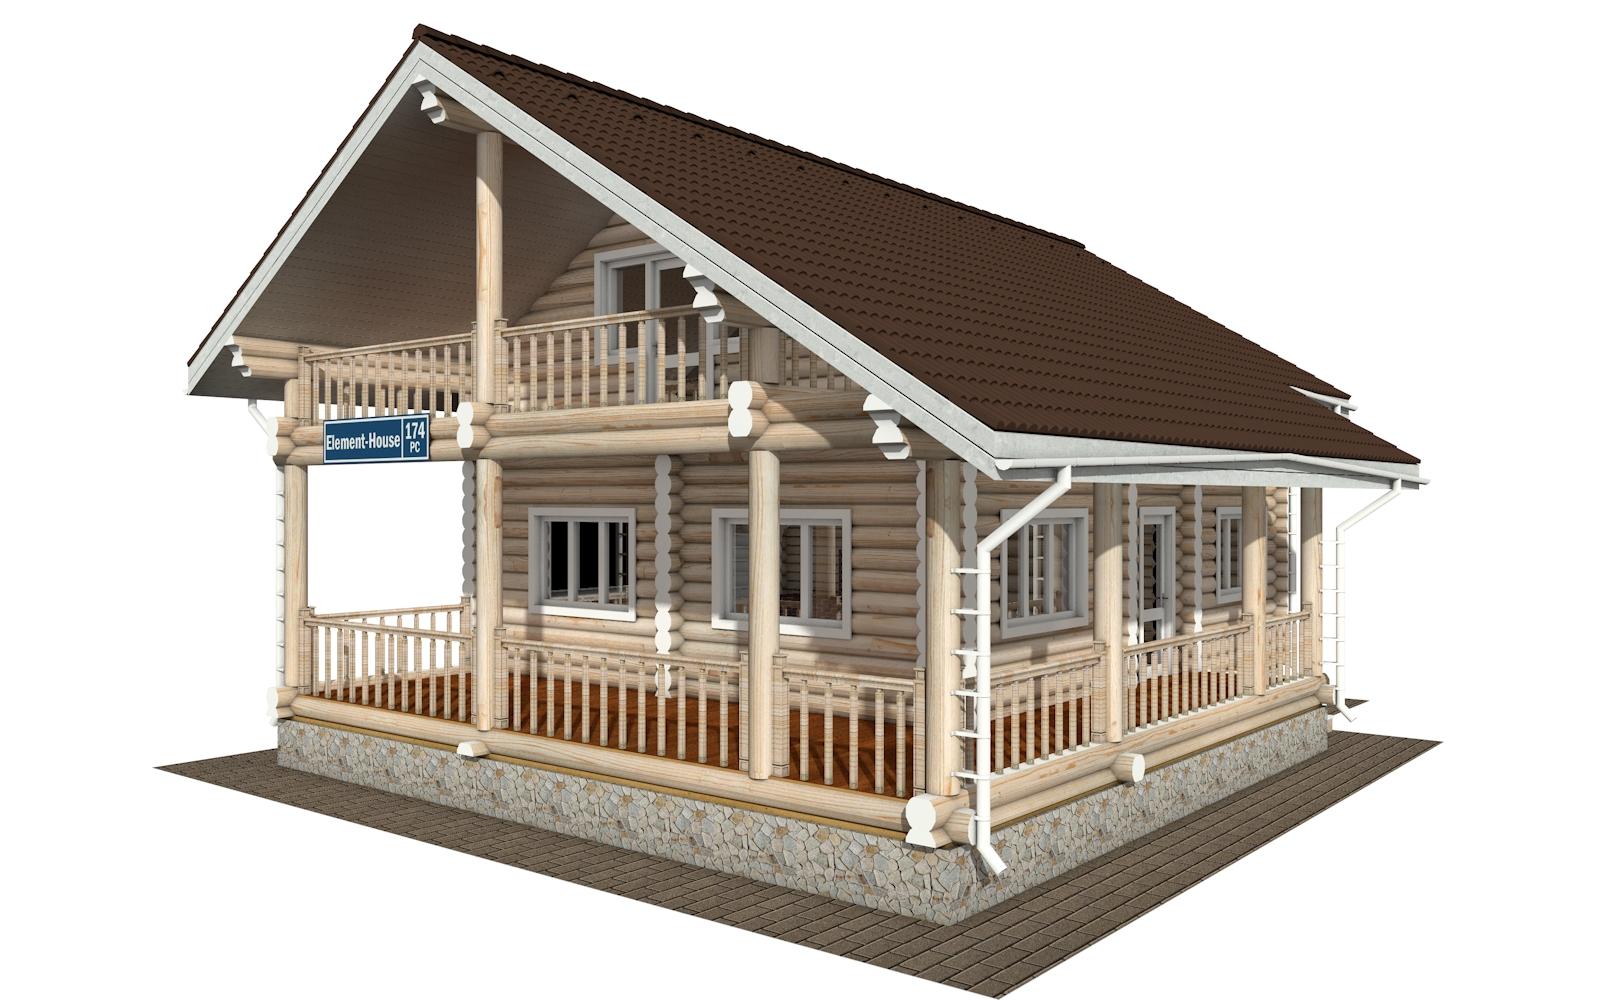 РС-174 - Проект дома из бревна с мансардой